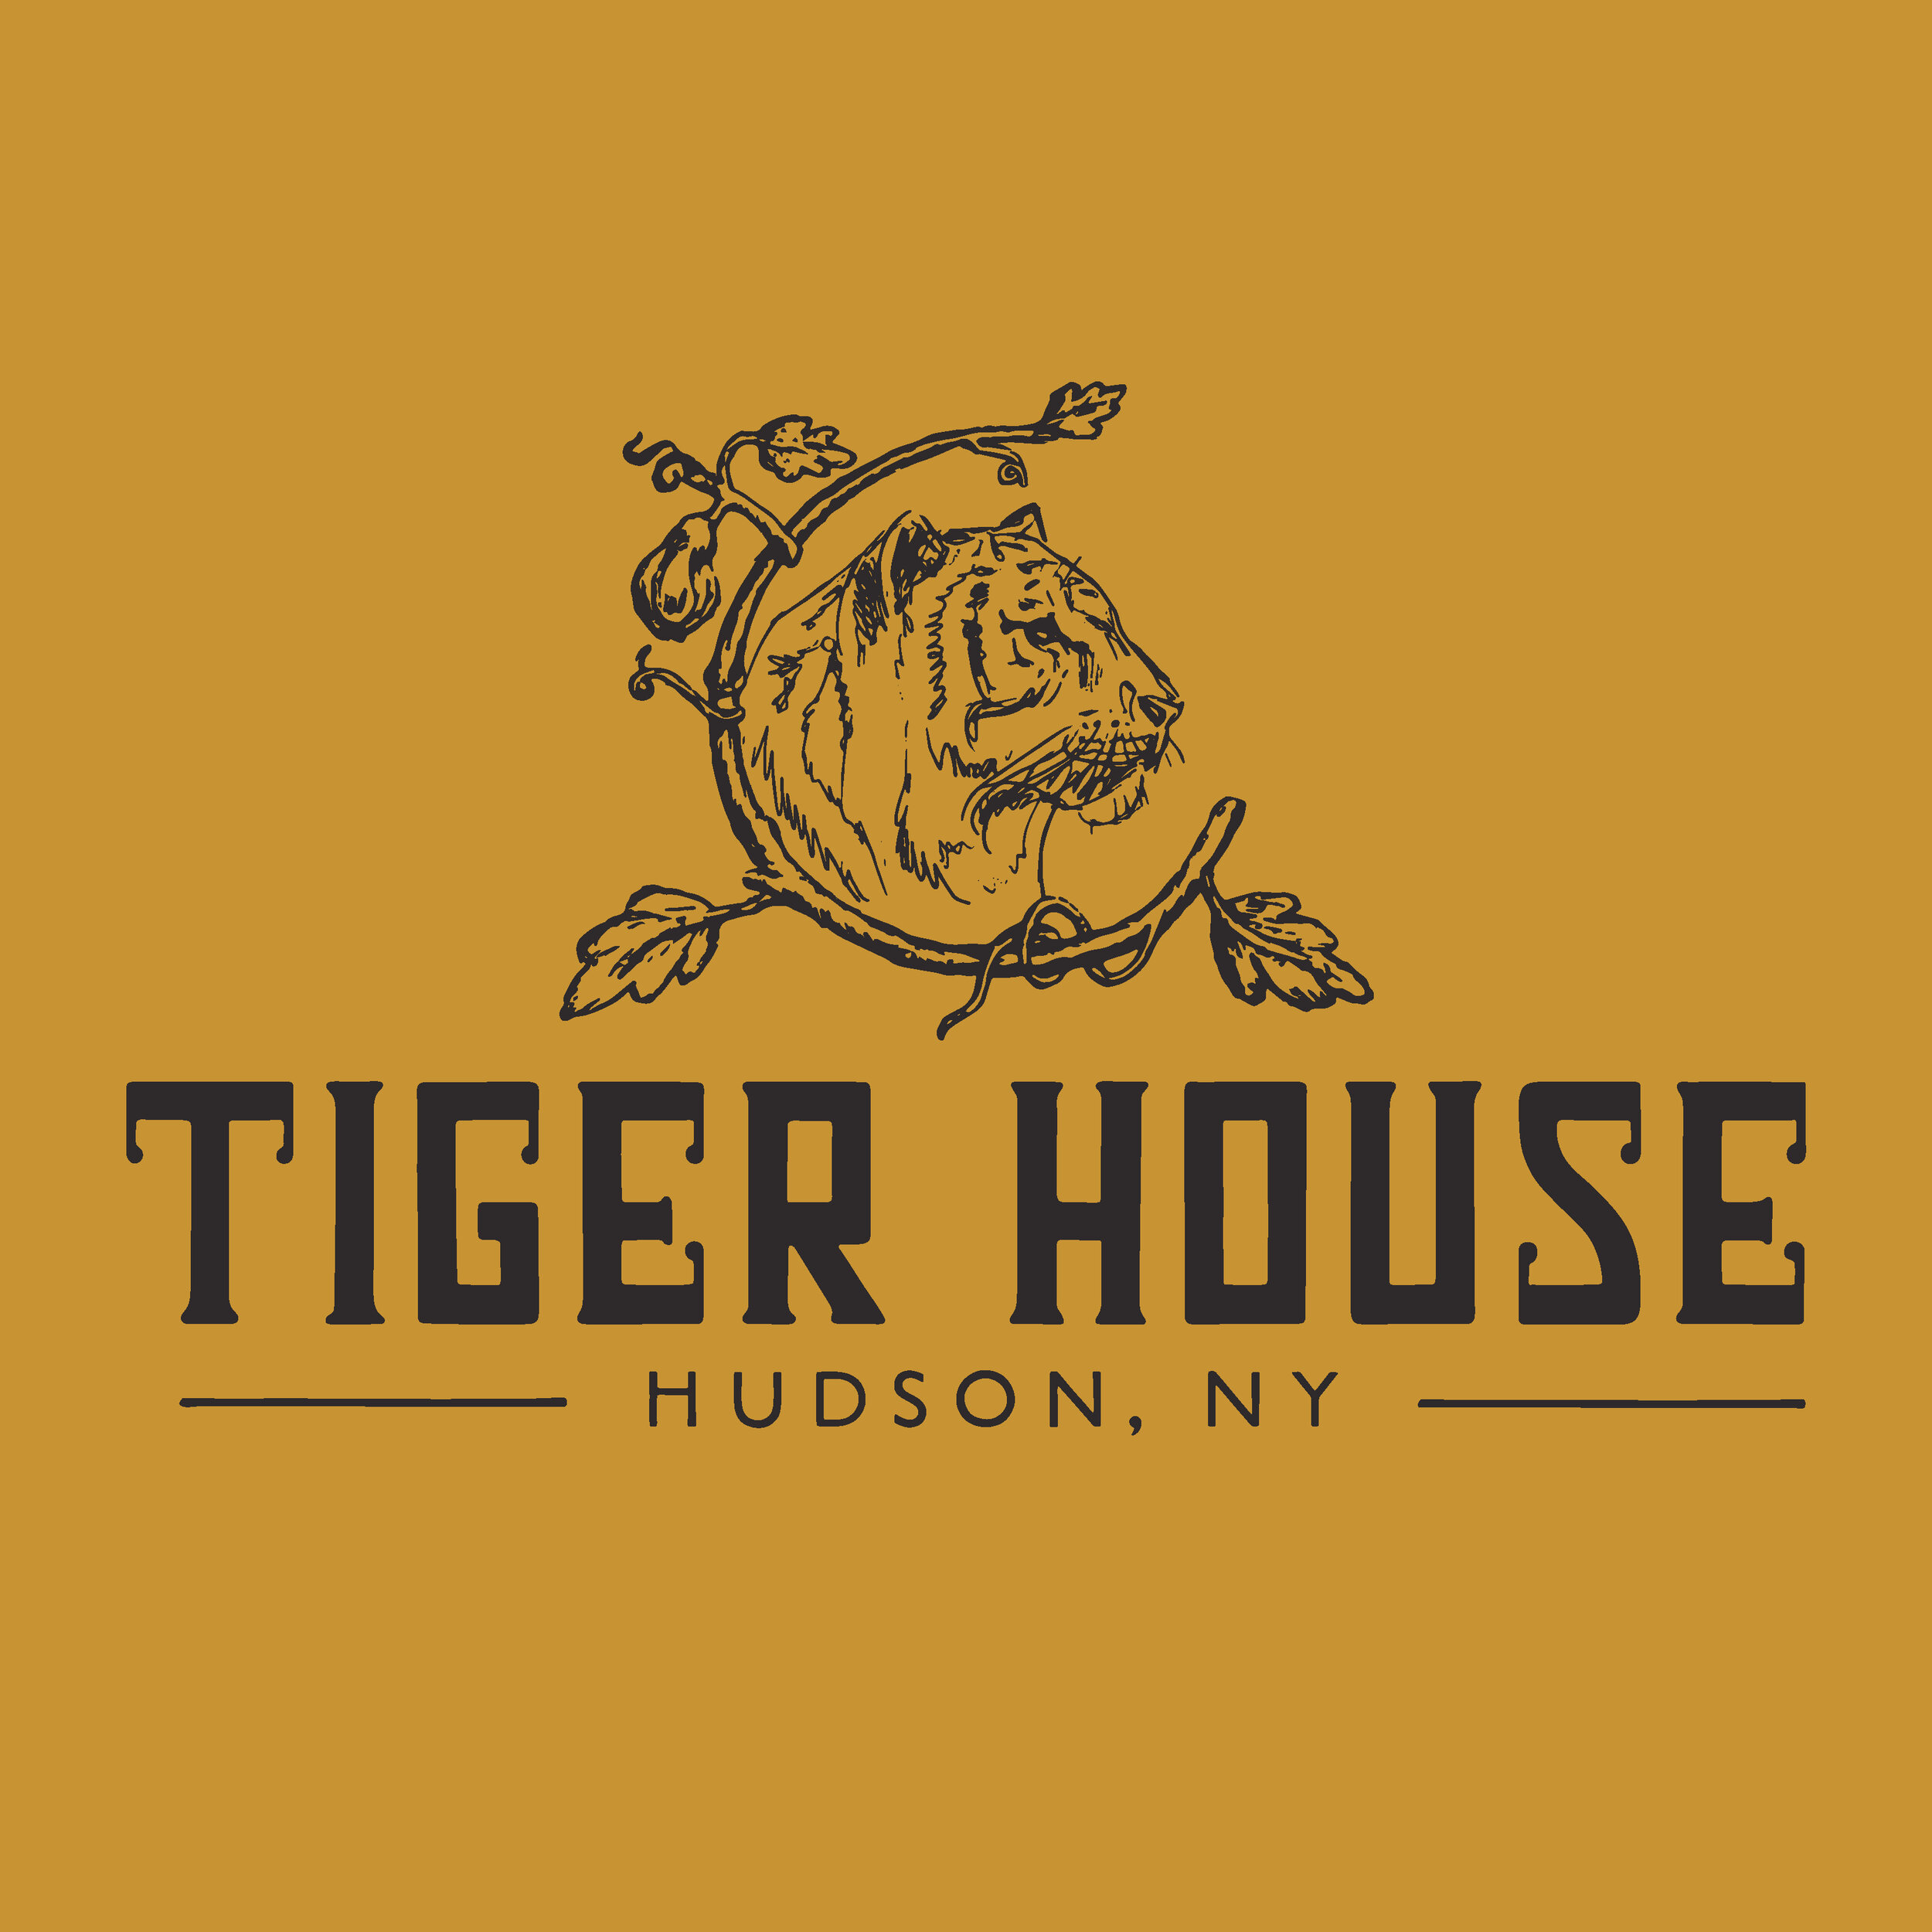 square graphics - 2019 Tiger house.jpg